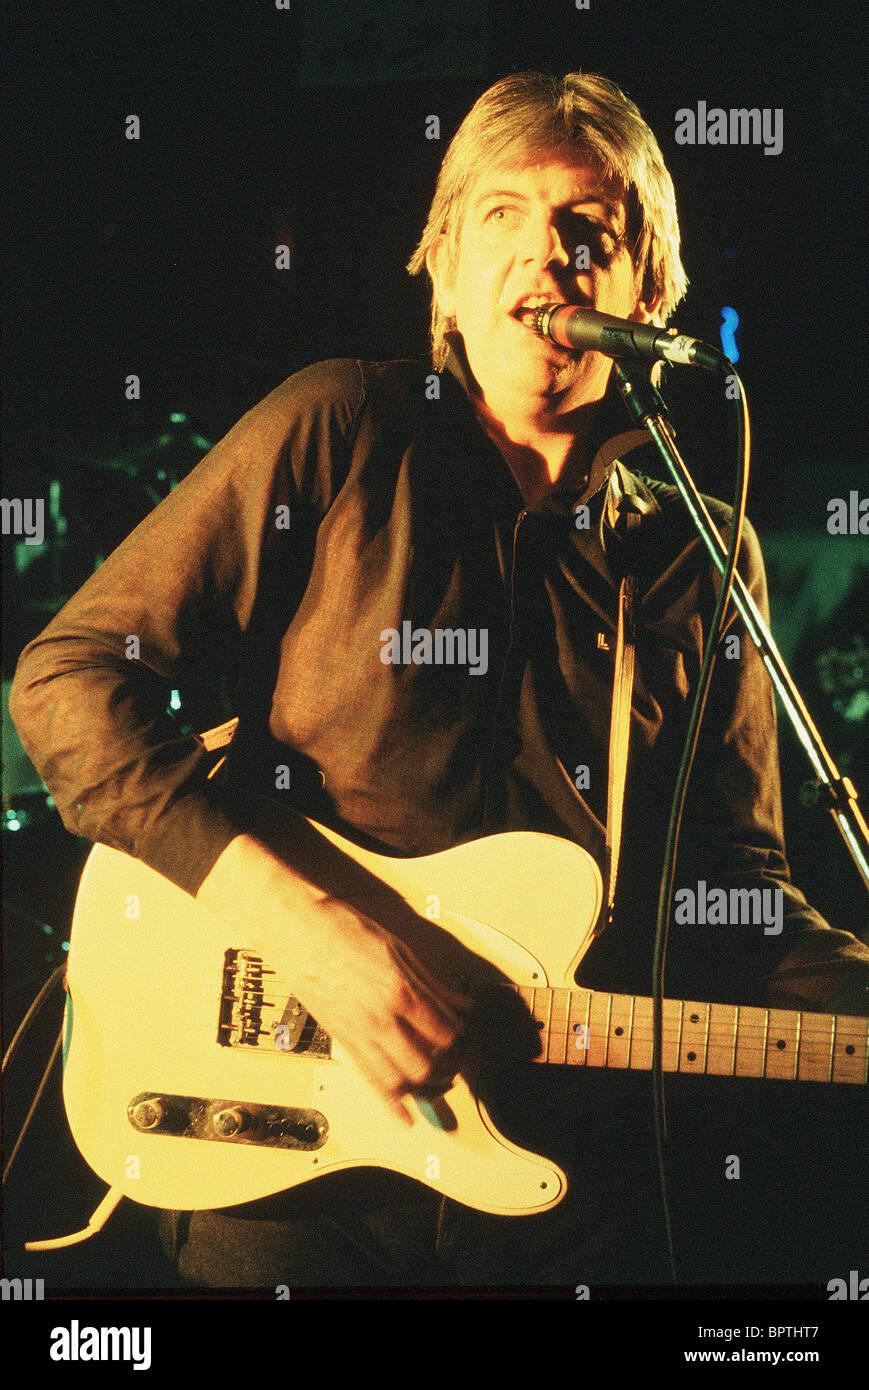 NICK LOWE cantante (1984) Immagini Stock